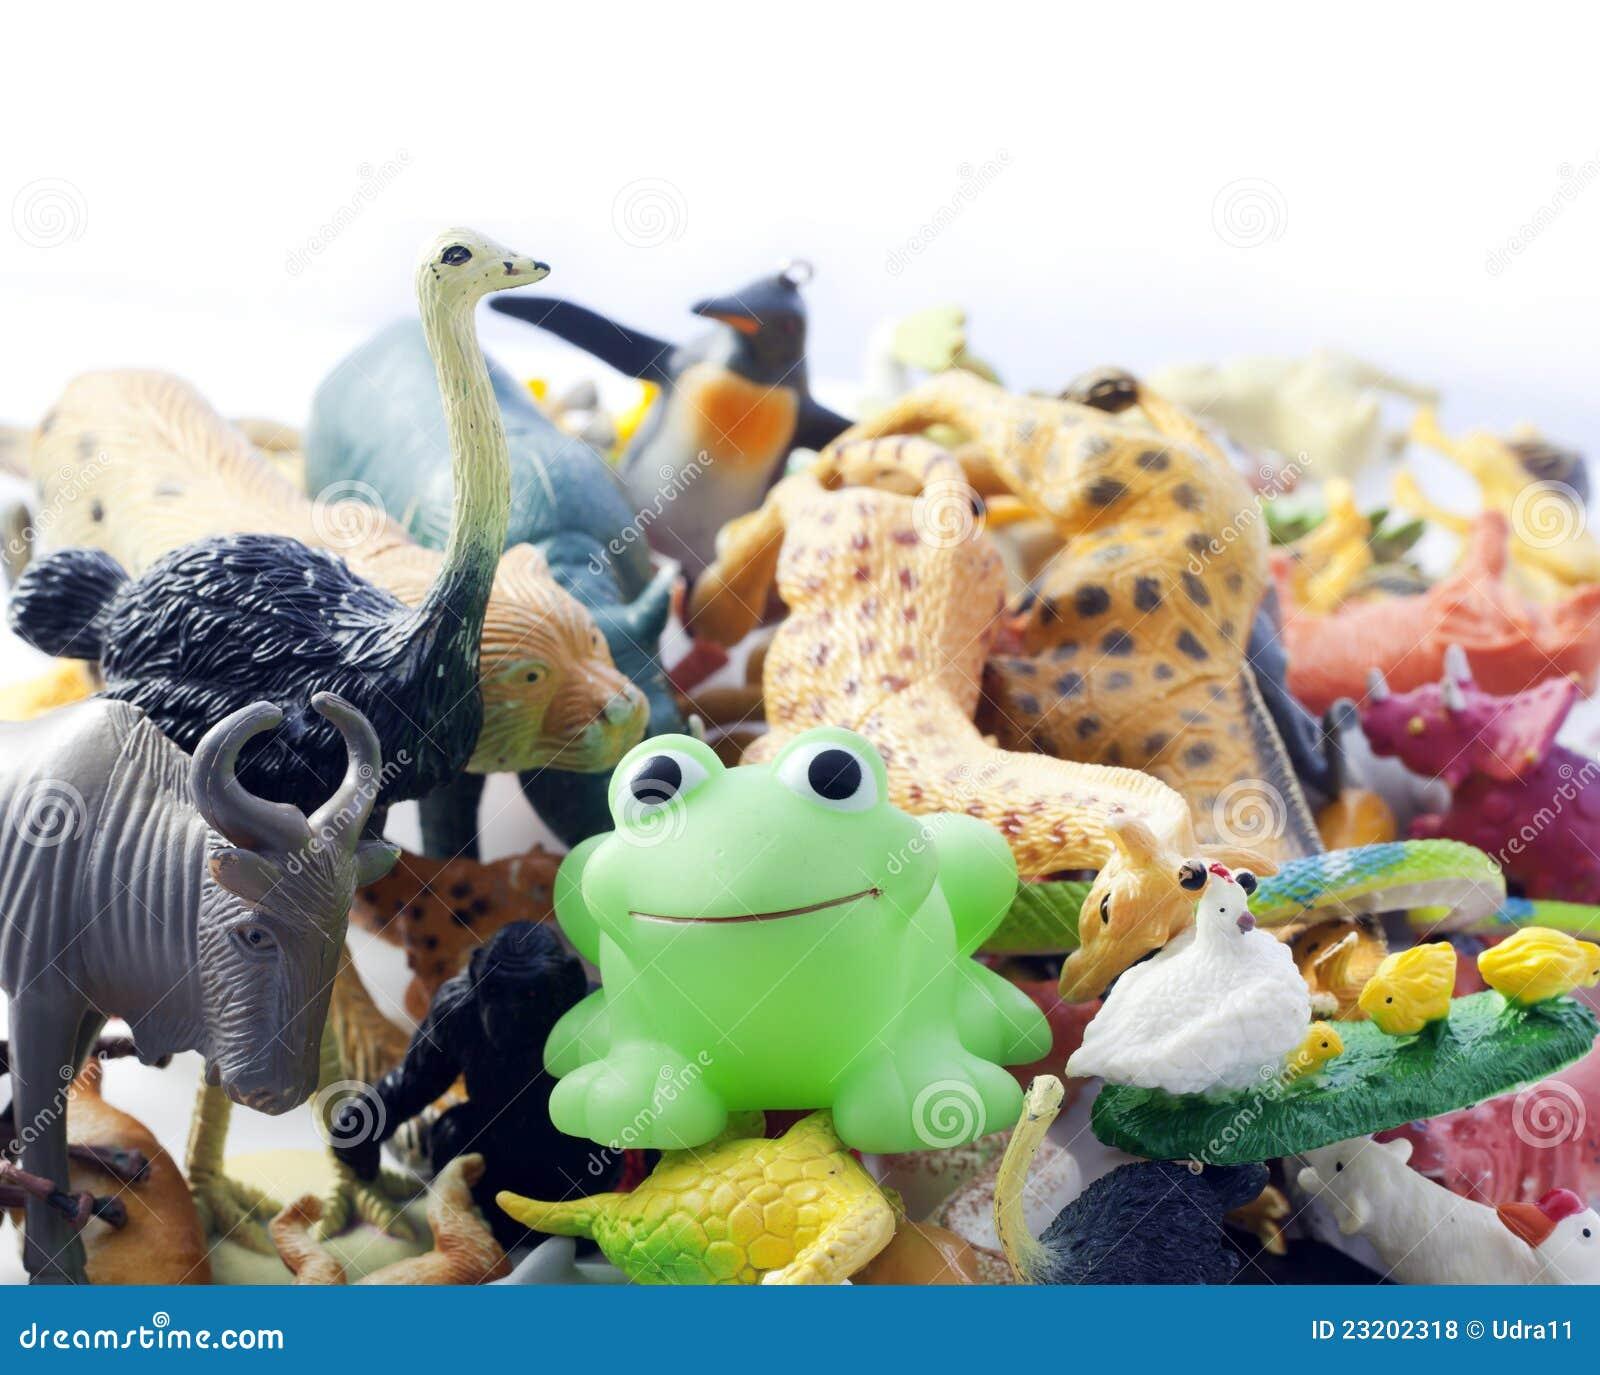 Plastic Messy Animals Toys Royalty Free Stock Photos